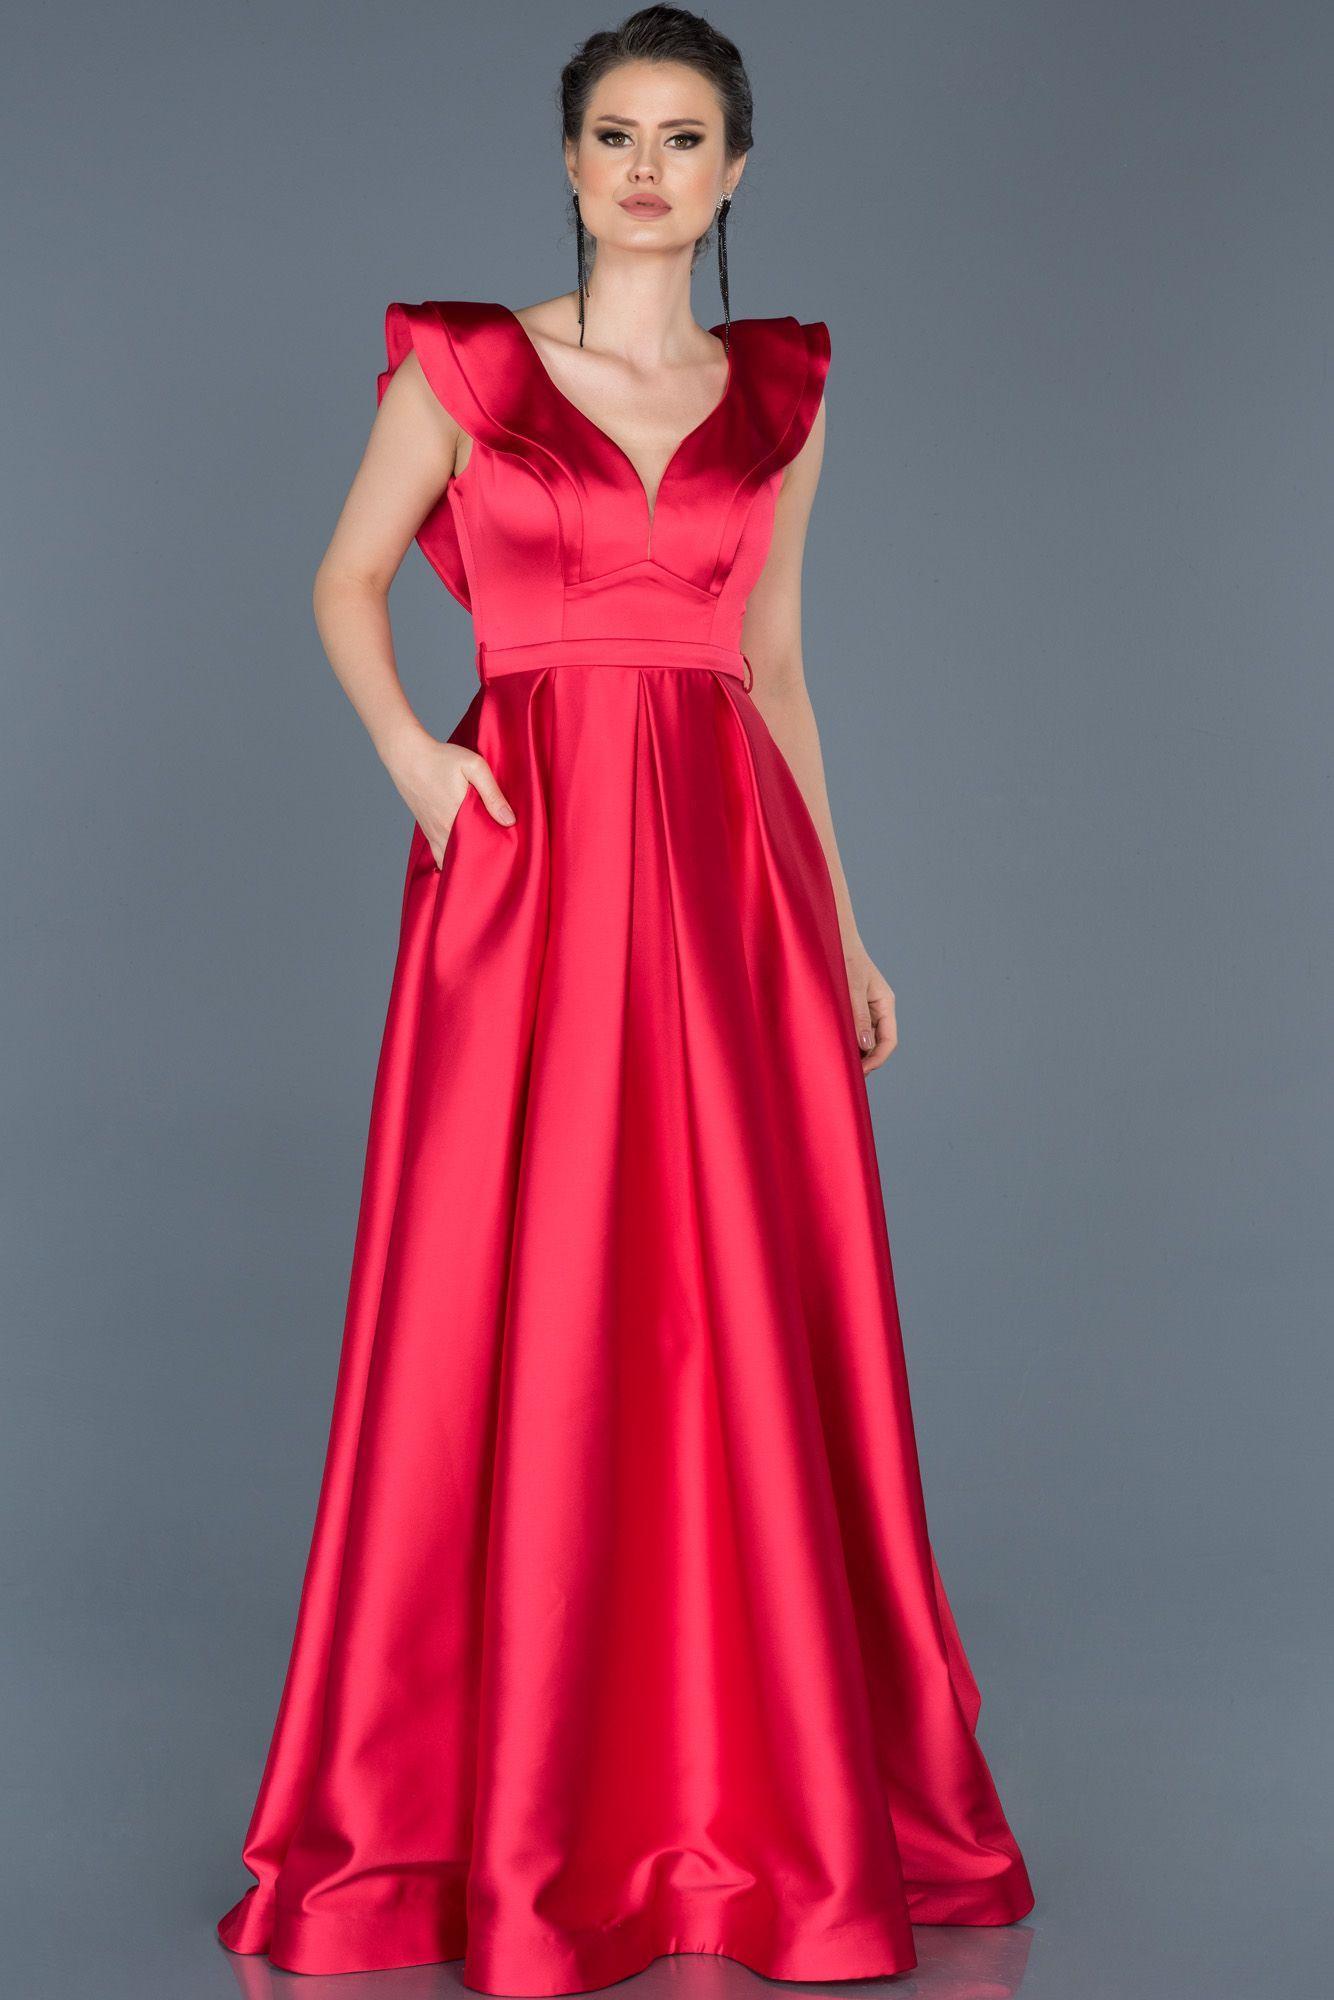 b0d90b083e9c6 Kolsuz V Yaka Nişan Elbisesi ABU576 | 2019 Trend Abiye Elbise ...